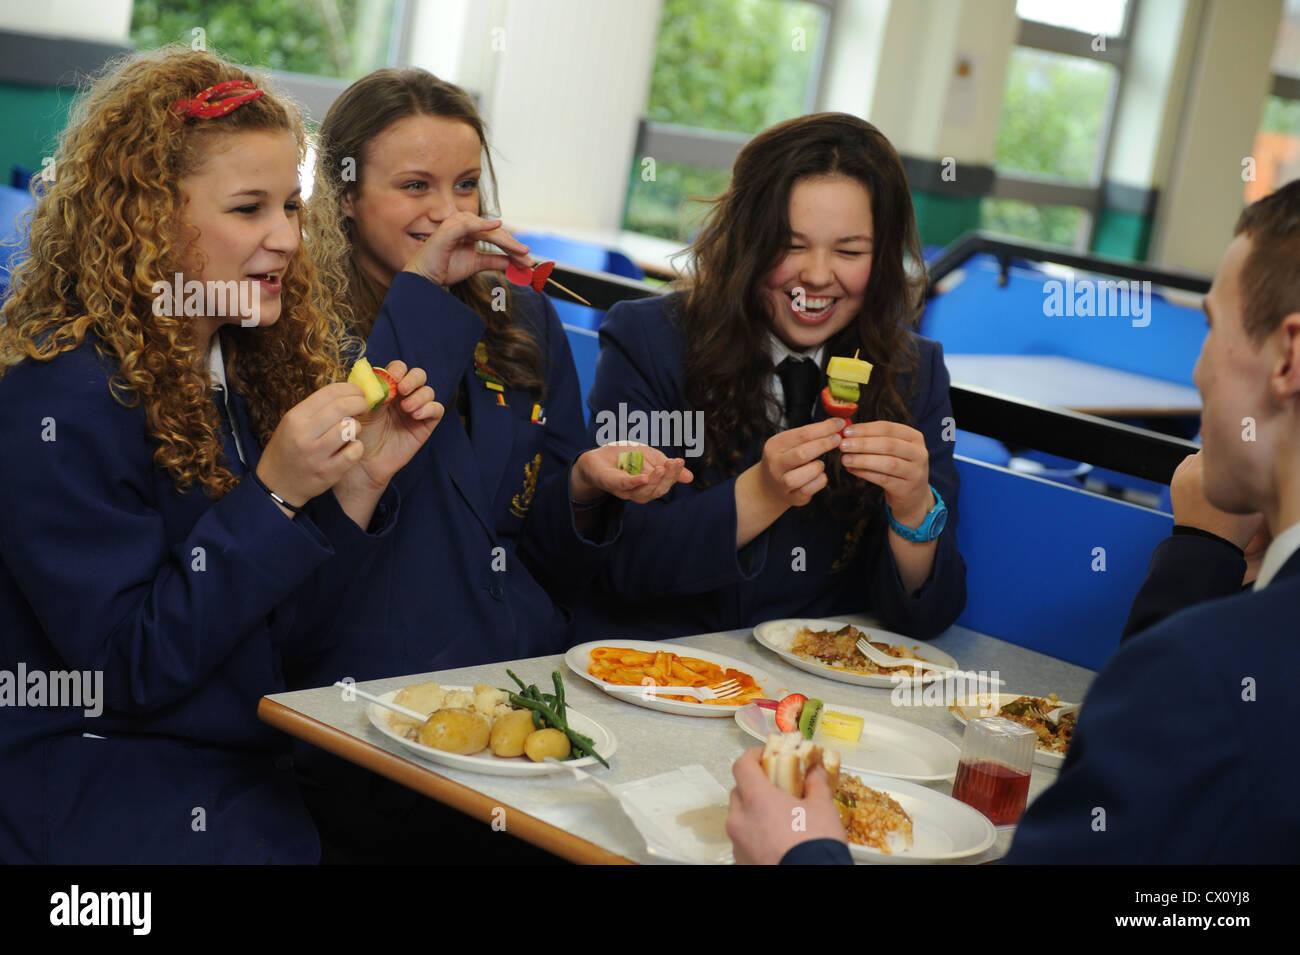 Free School Meals Stock Photos & Free School Meals Stock